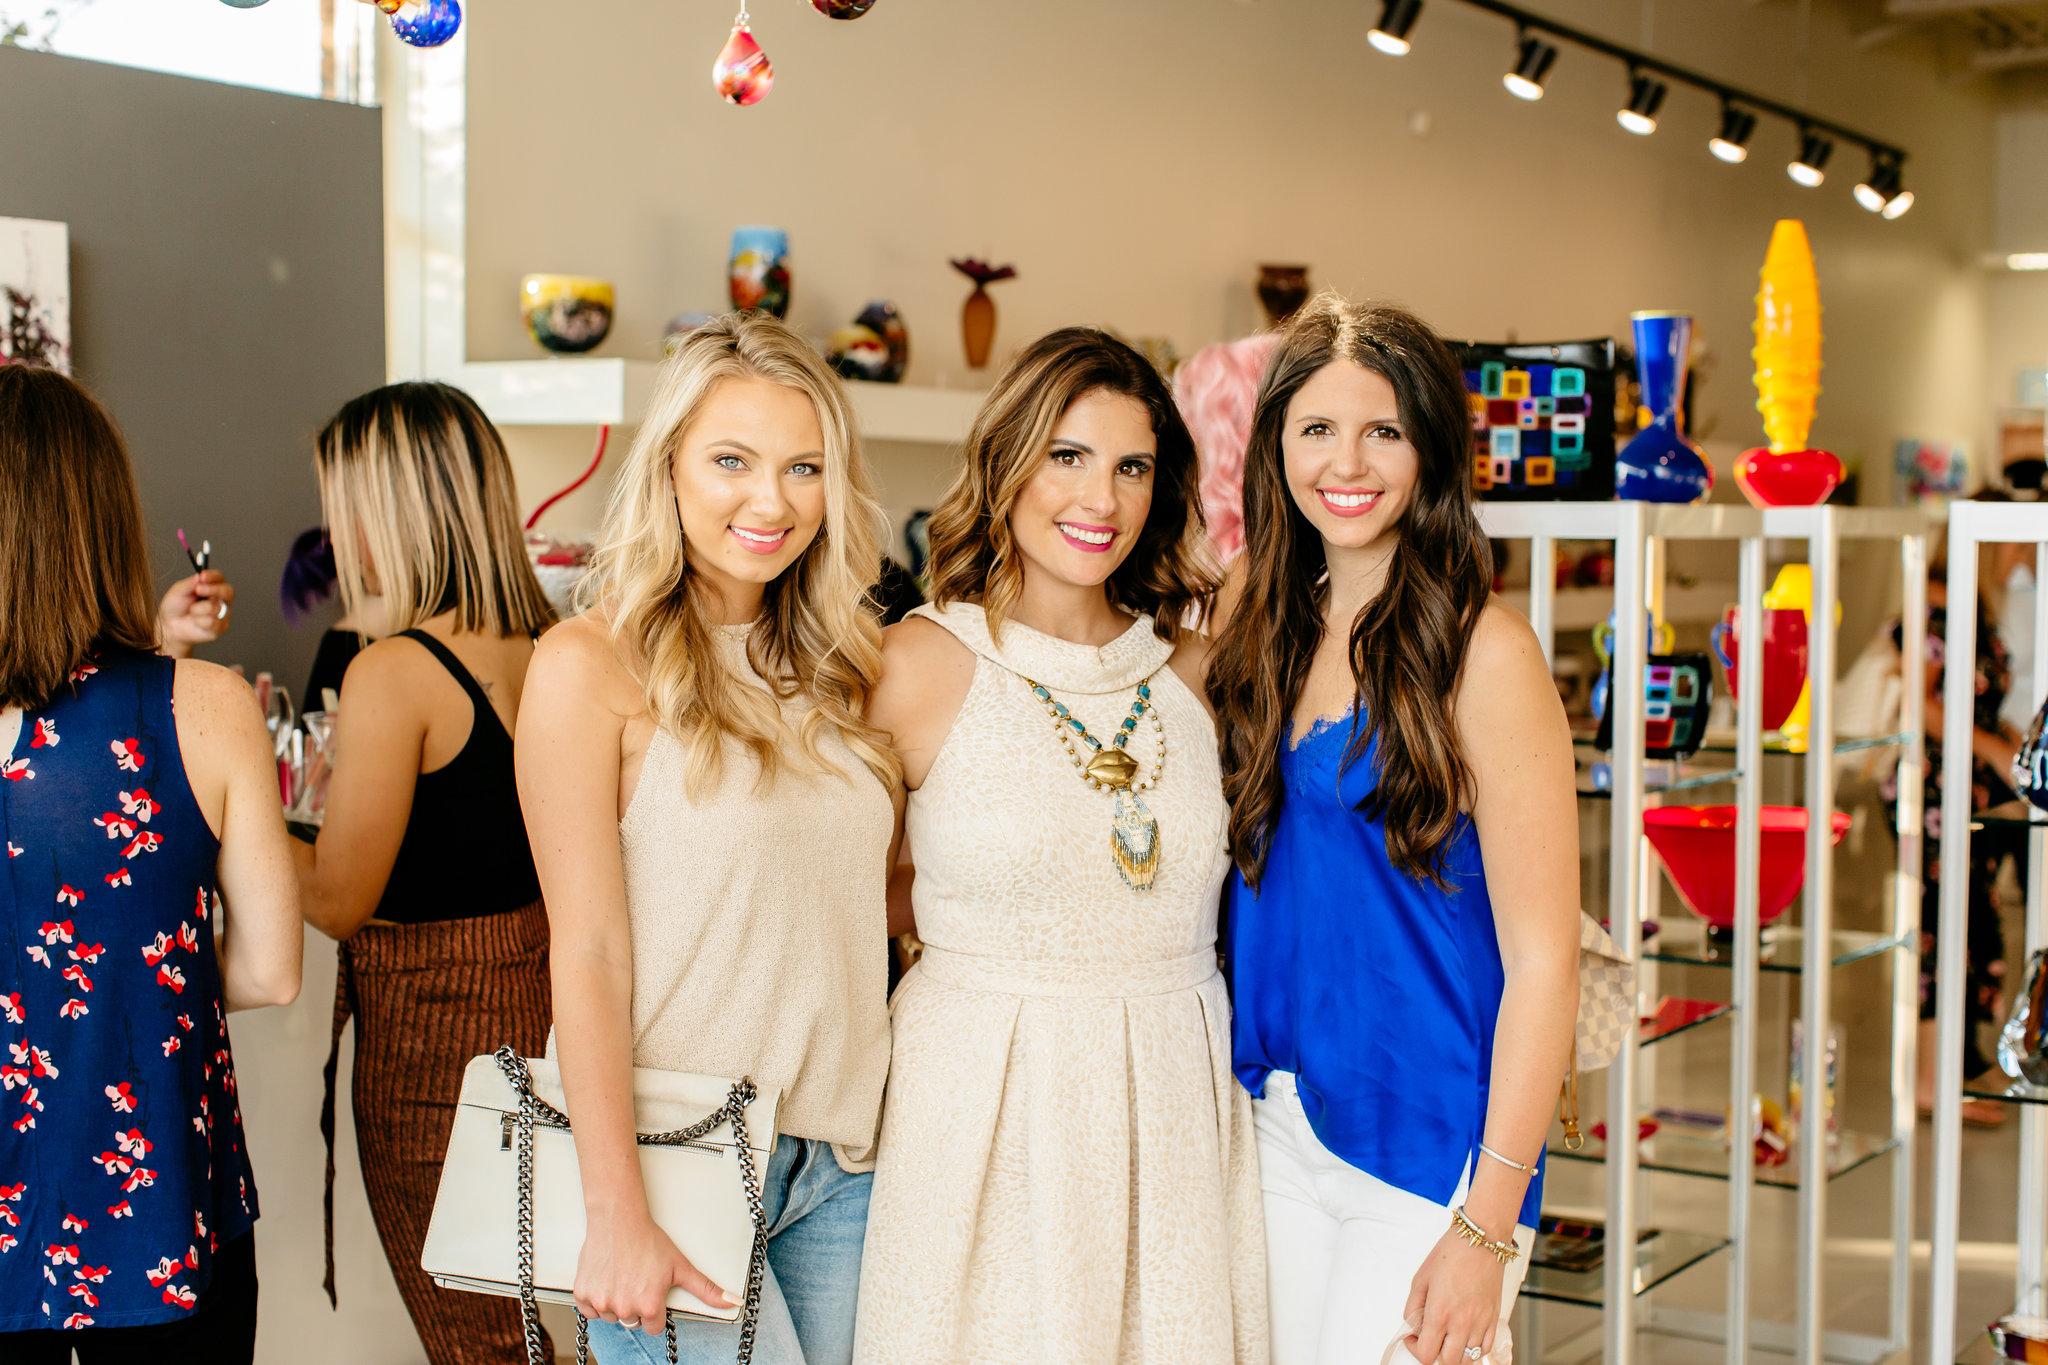 Alexa-Vossler-Photo_Dallas-Event-Photographer_Brite-Bar-Beauty-2018-Lipstick-Launch-Party-147.jpg